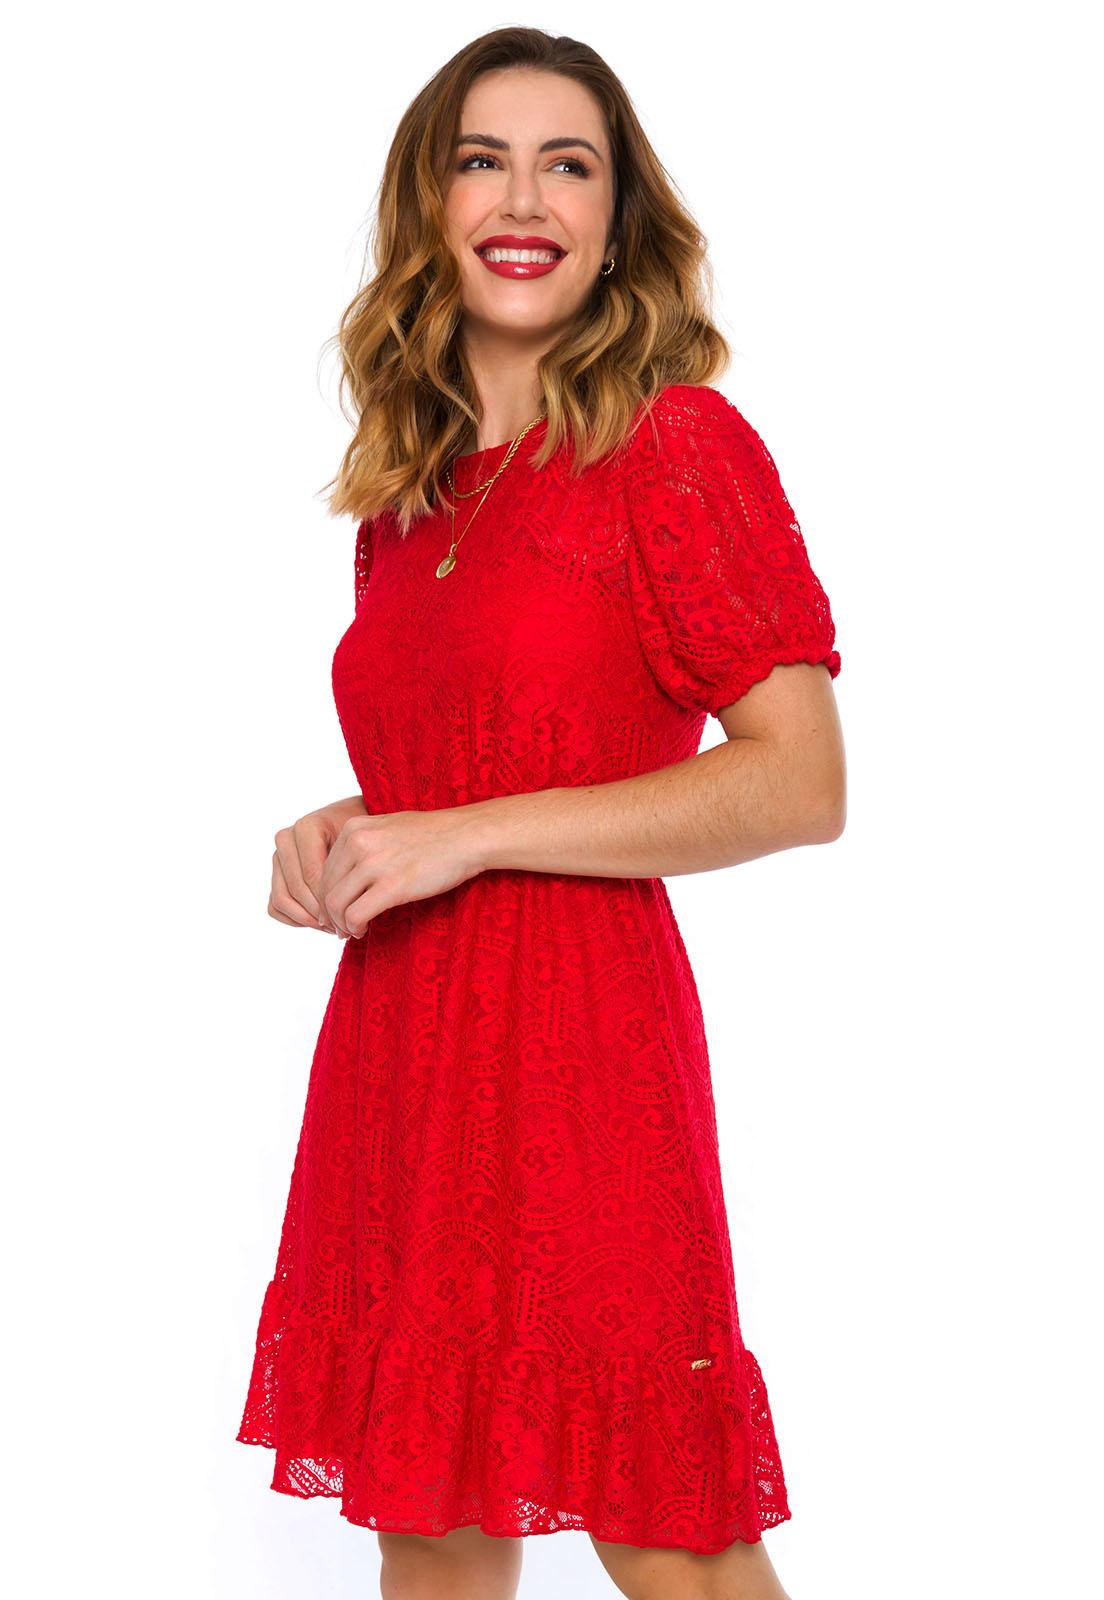 Vestido Curto Renda Vermelho